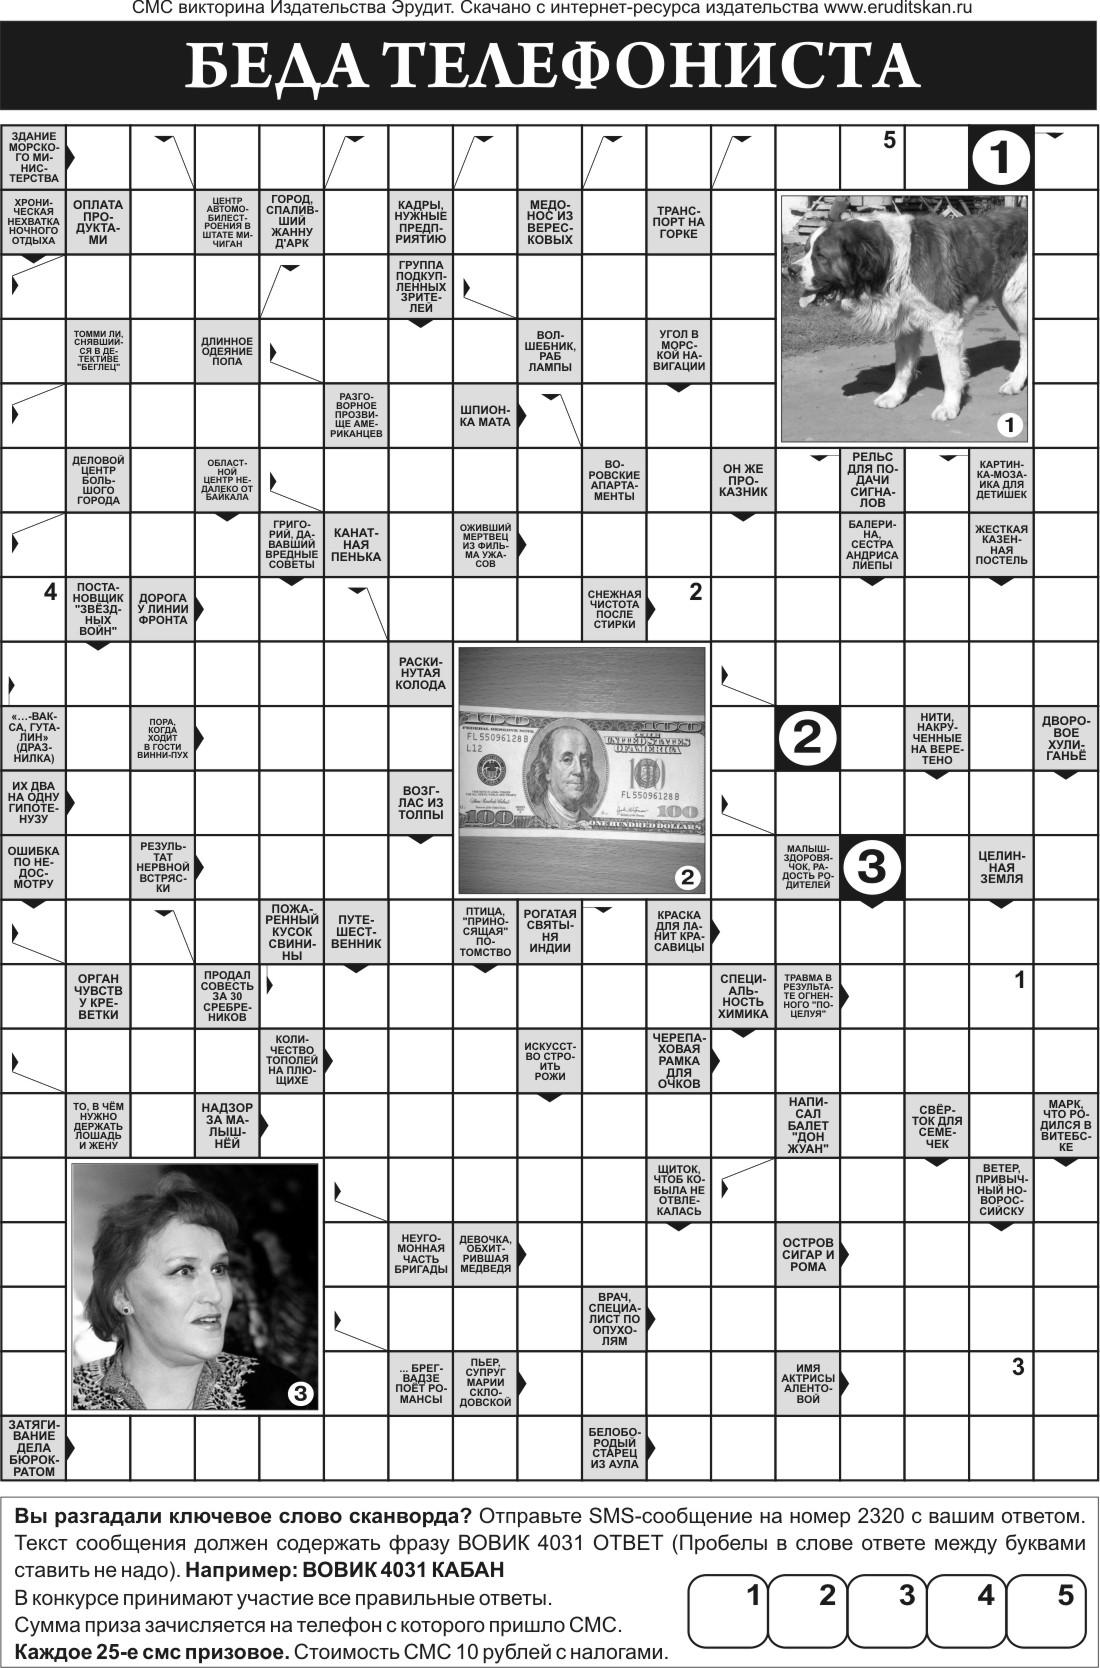 сканворд скачать для печати pdf